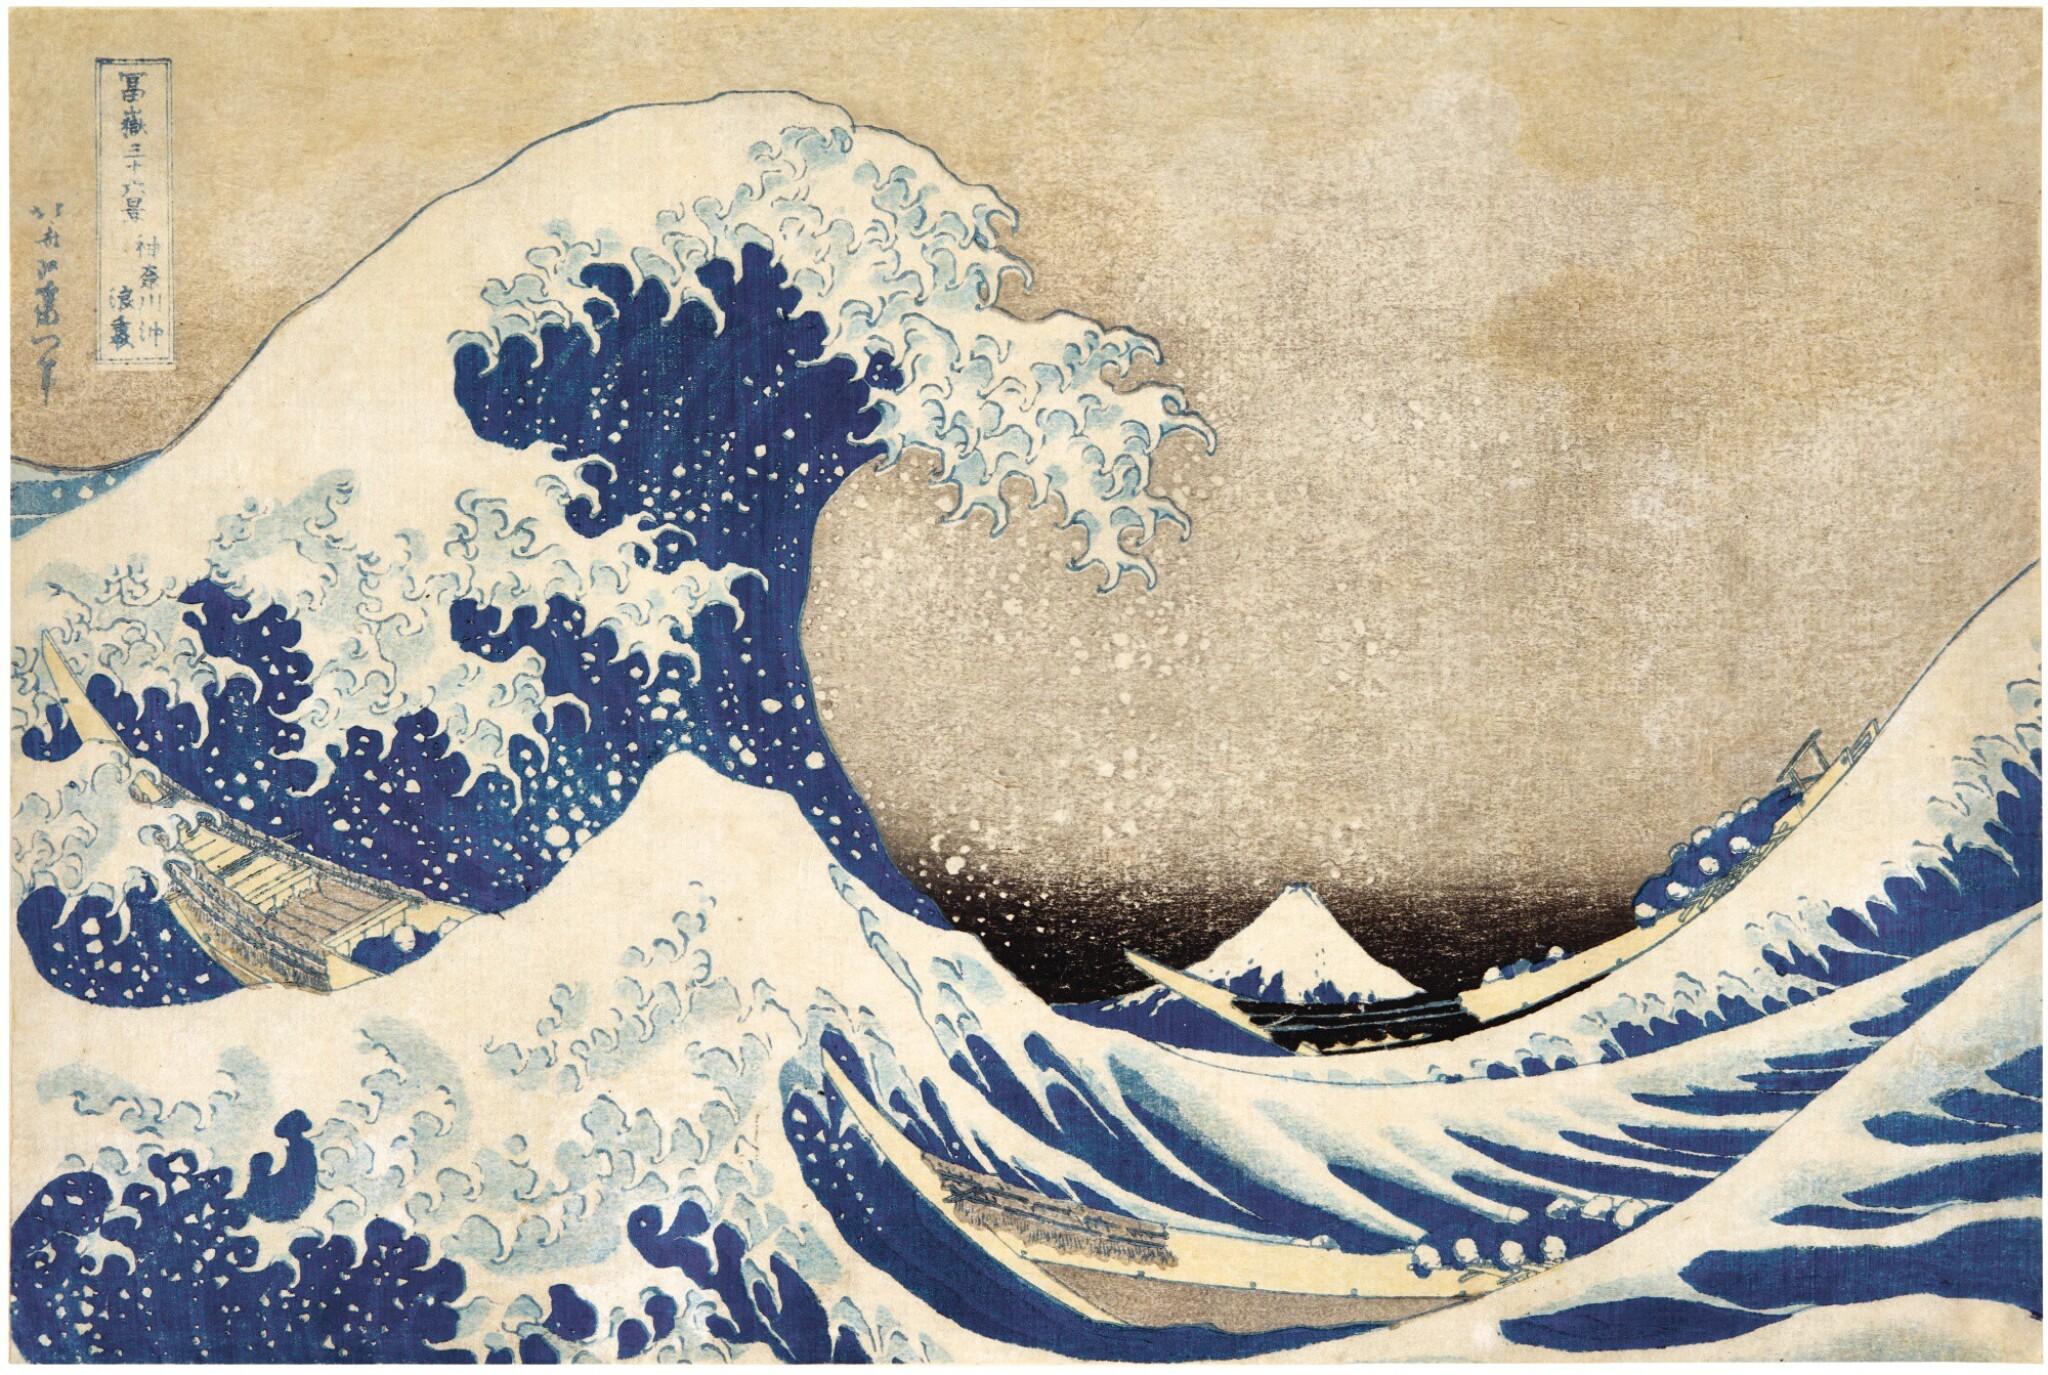 View full screen - View 1 of Lot 17. KATSUSHIKA HOKUSAI (1760–1849), EDO PERIOD, 19TH CENTURY | UNDER THE WAVE OFF KANAGAWA (KANAGAWA-OKI NAMI-URA), ALSO KNOWN AS THE GREAT WAVE.